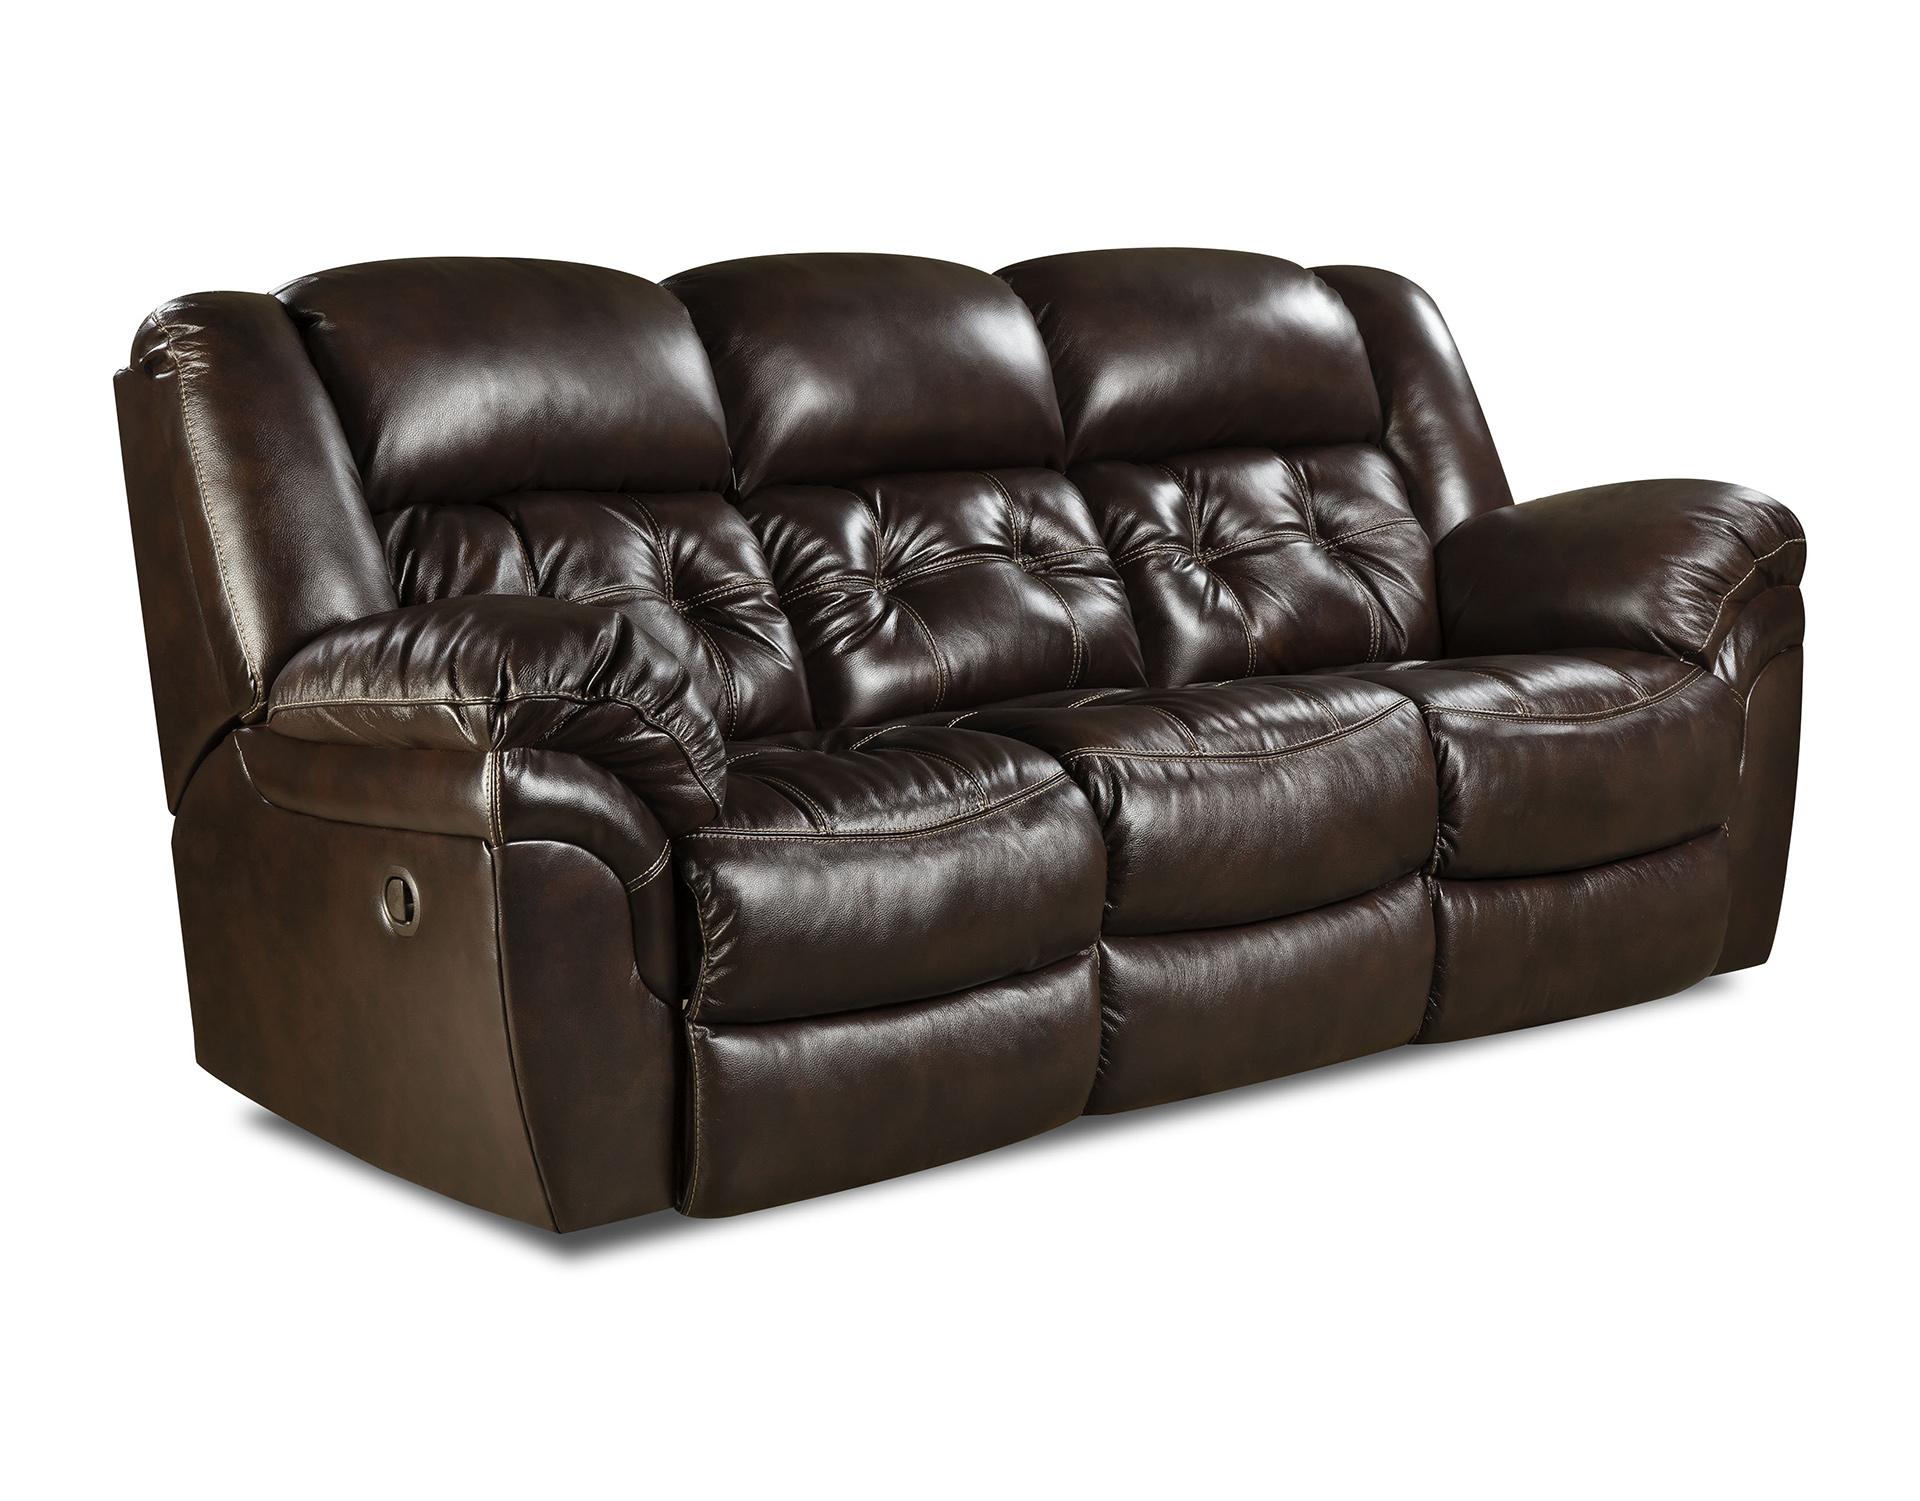 Homestretch Reclining Sofa Homestretch Padre 129 22 15